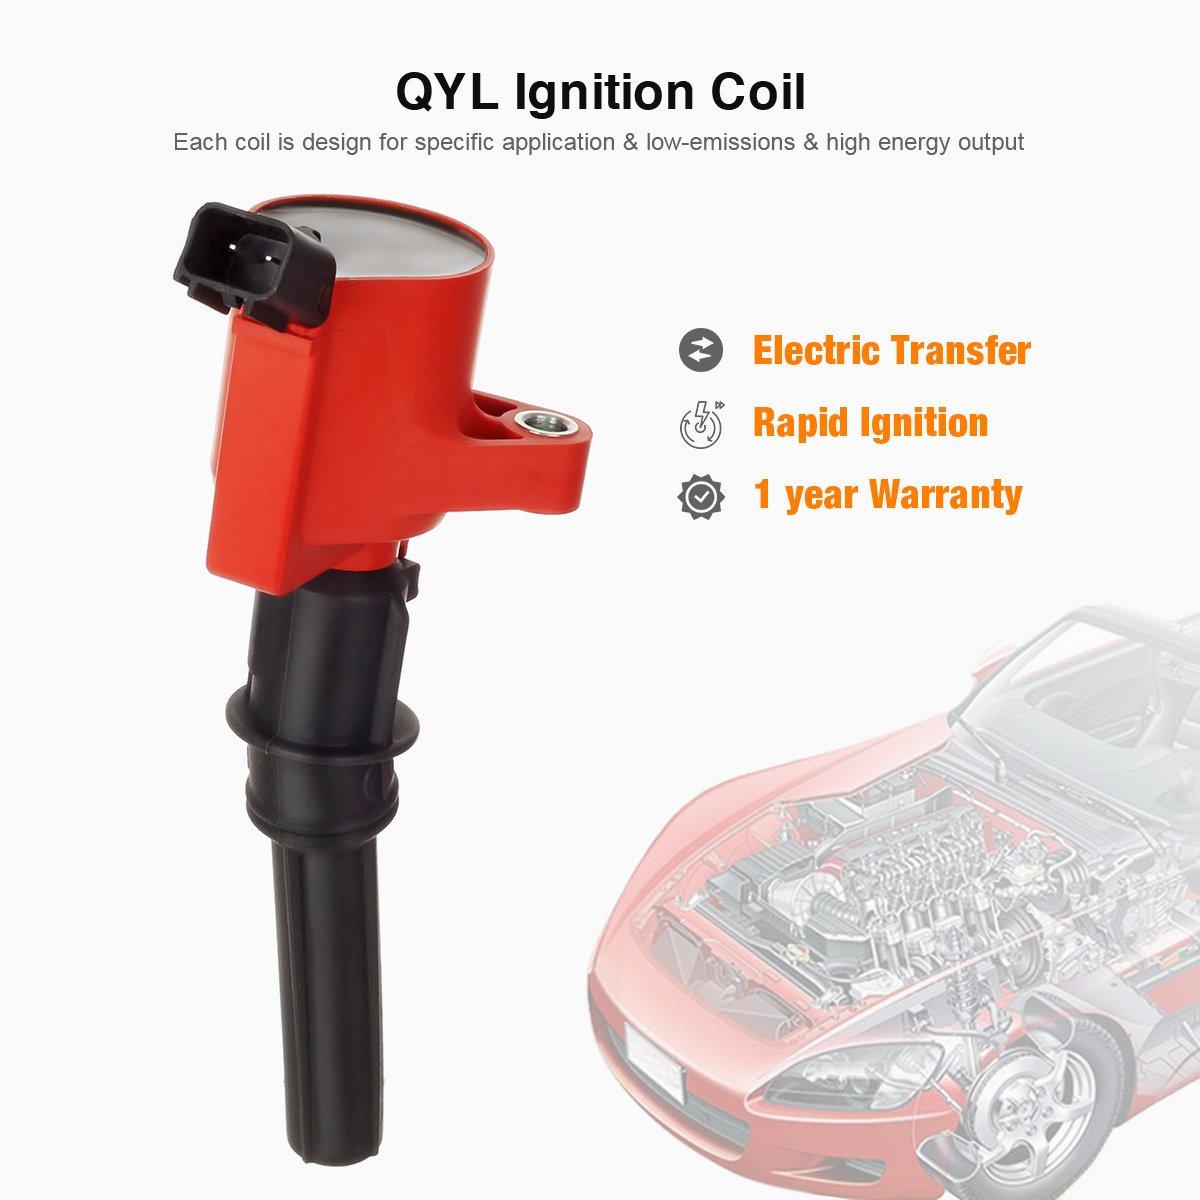 Paquete de 8 bobinas de encendido de alto rendimiento, color rojo, para Ford Lincoln Mercury 4,6 L 5,4 L V8 DG508 C1454 C1417 FD503 (no sirve para 2004 F150 ...